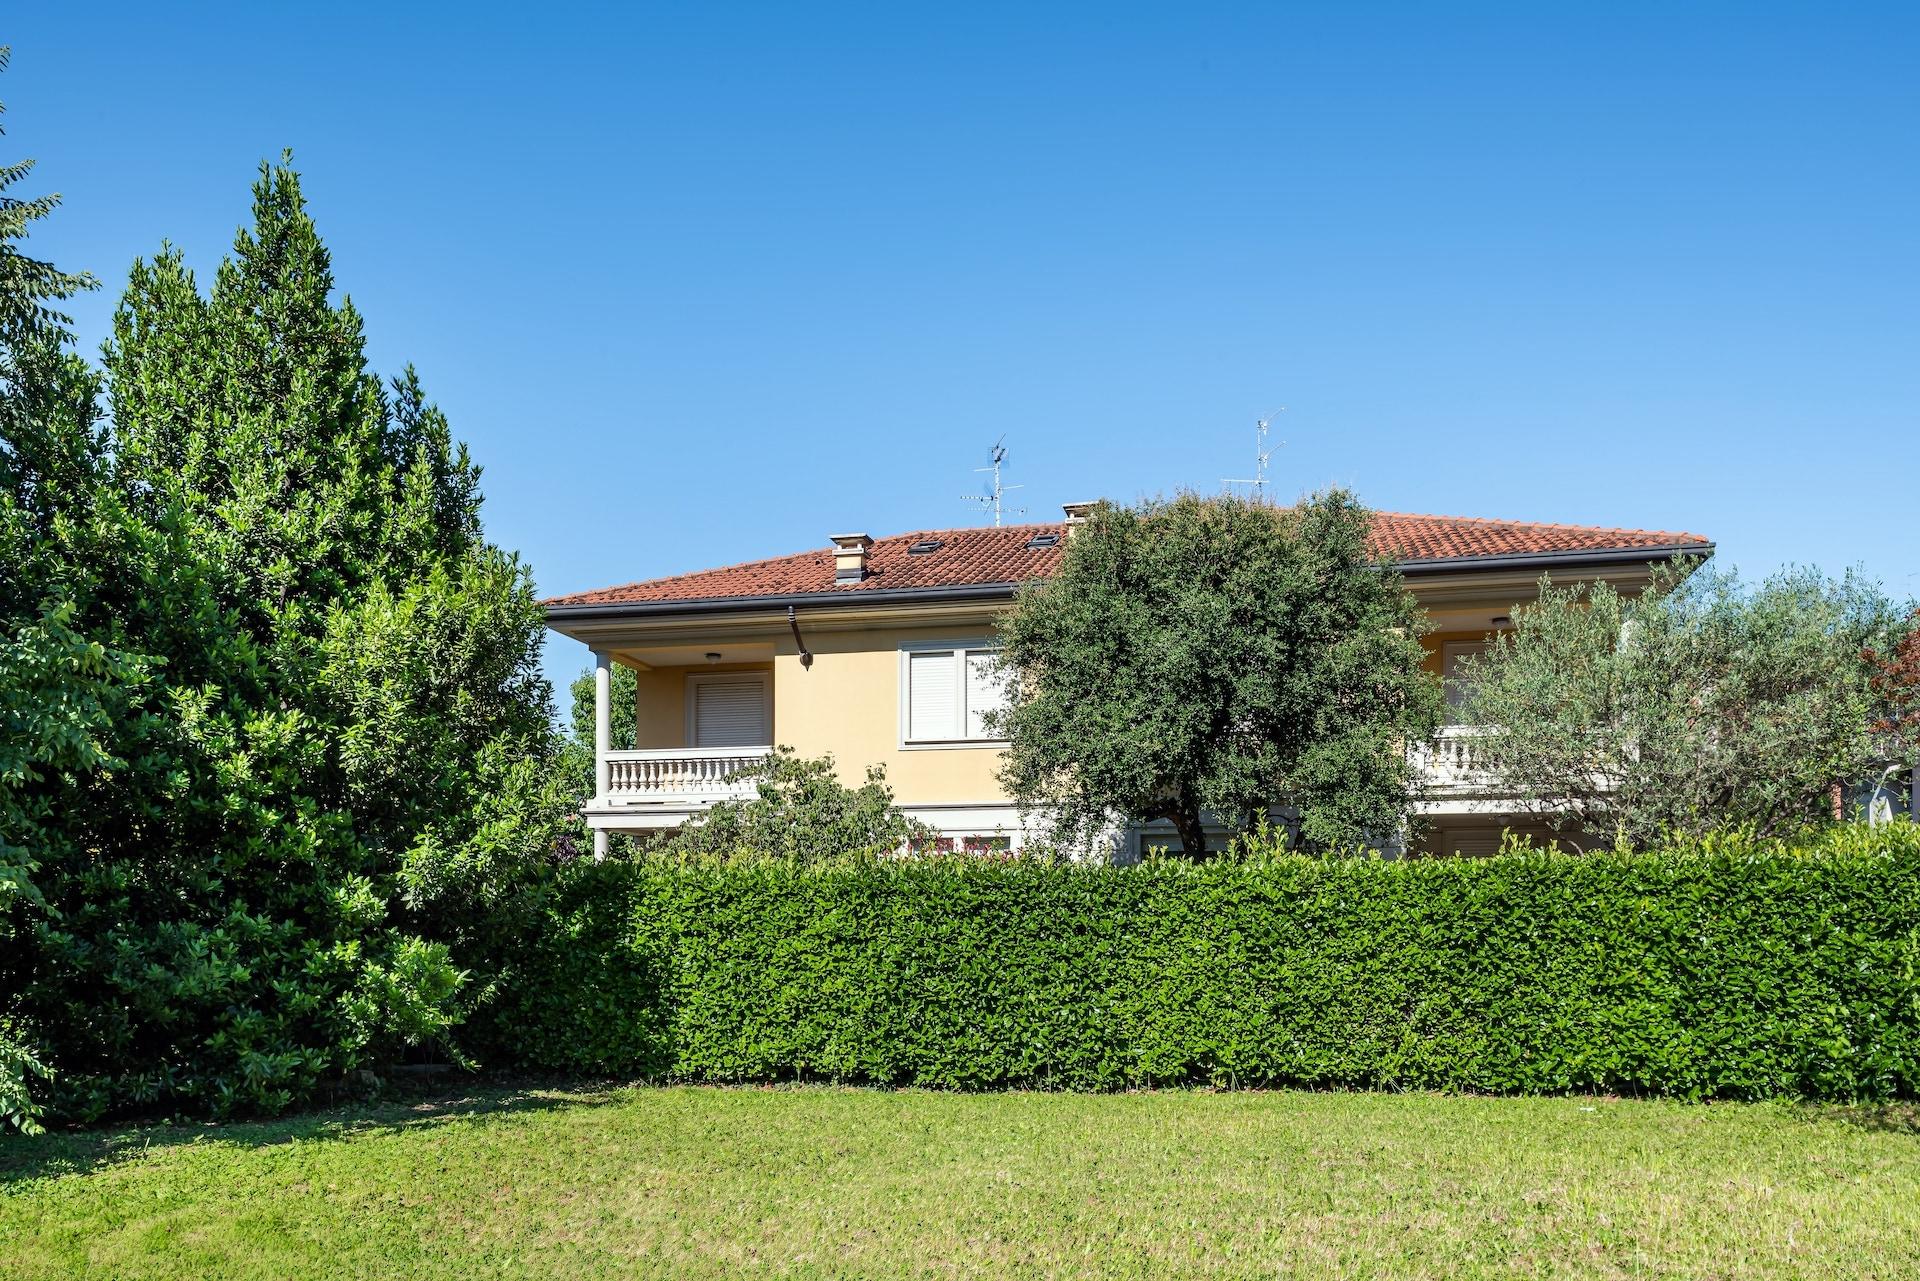 Villa Bifamilaire, Via D. L. Monza 31 Saronno-HDR-5